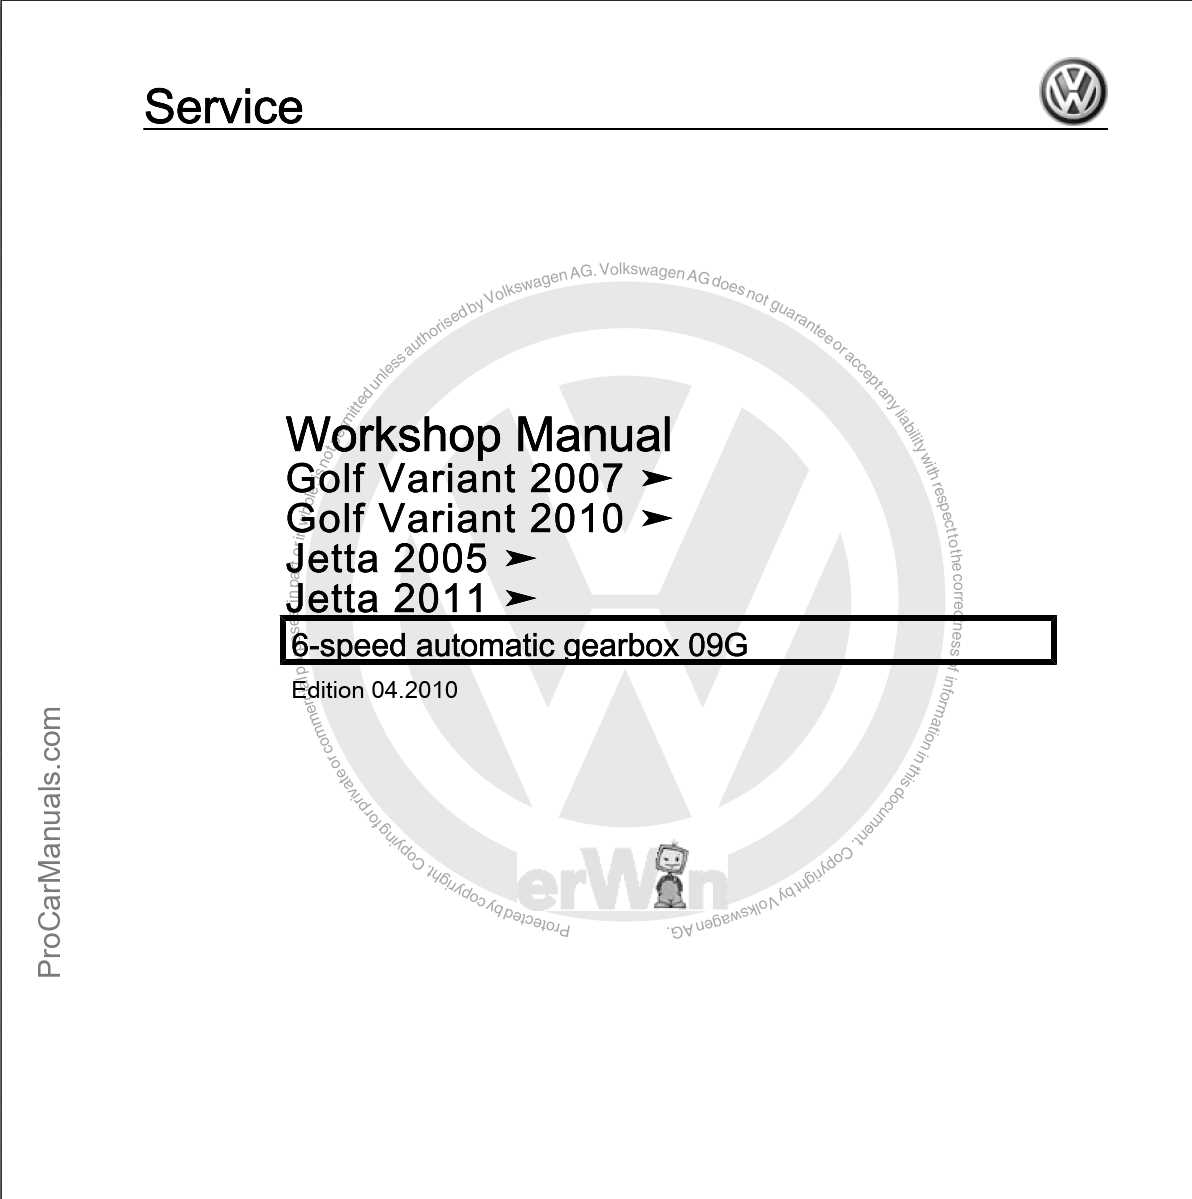 Volkswagen 6-speed Automatic Gearbox 09G Workshop Manual